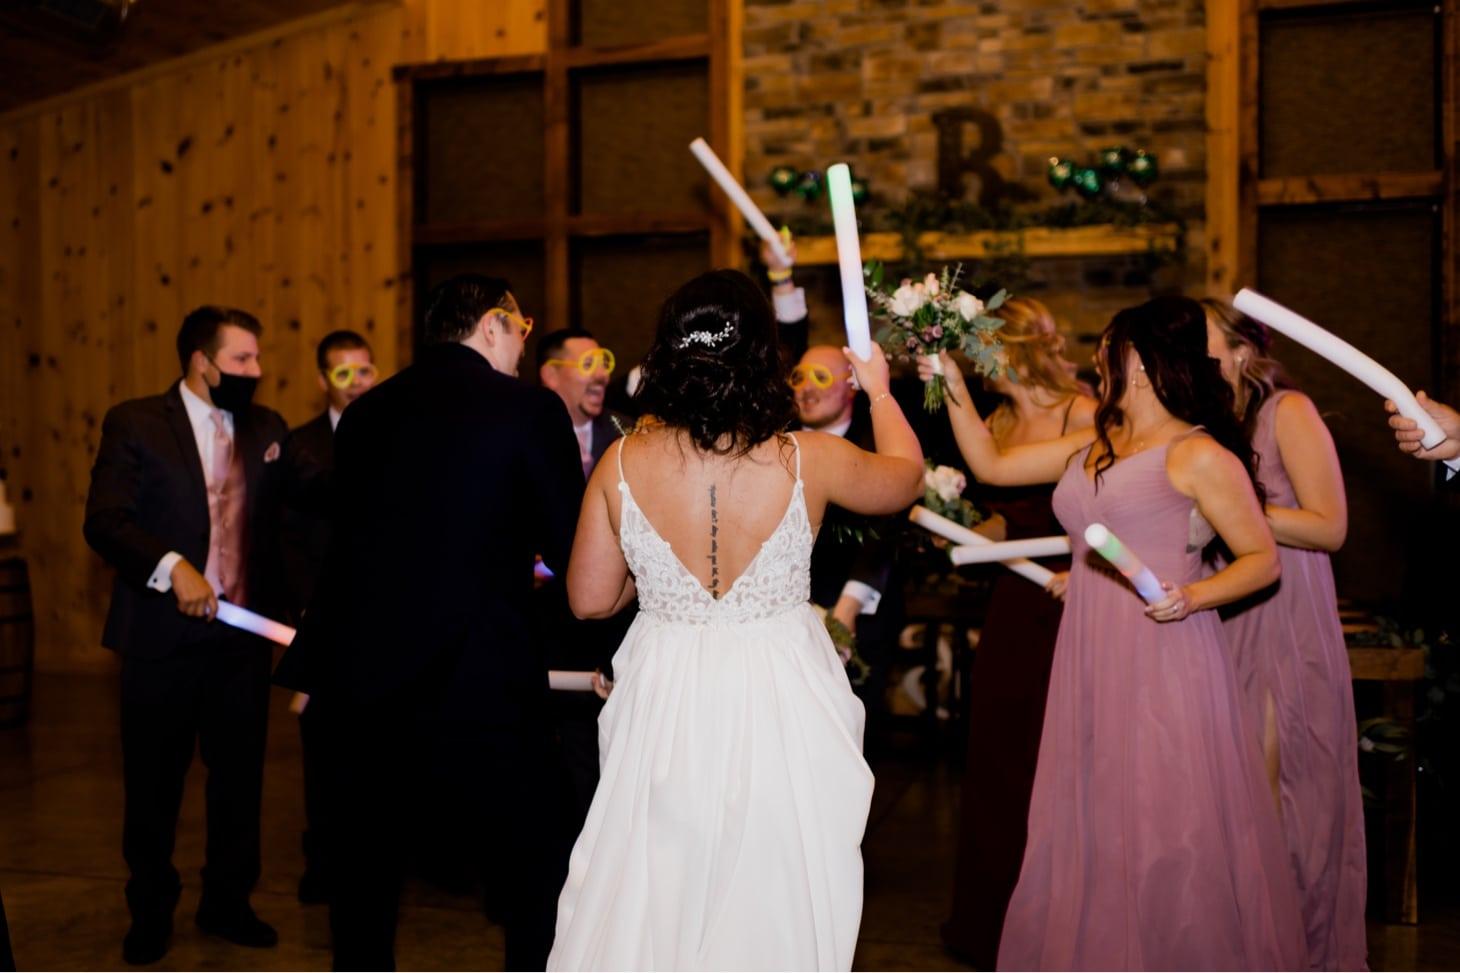 bridal party dancing at country lane lodge